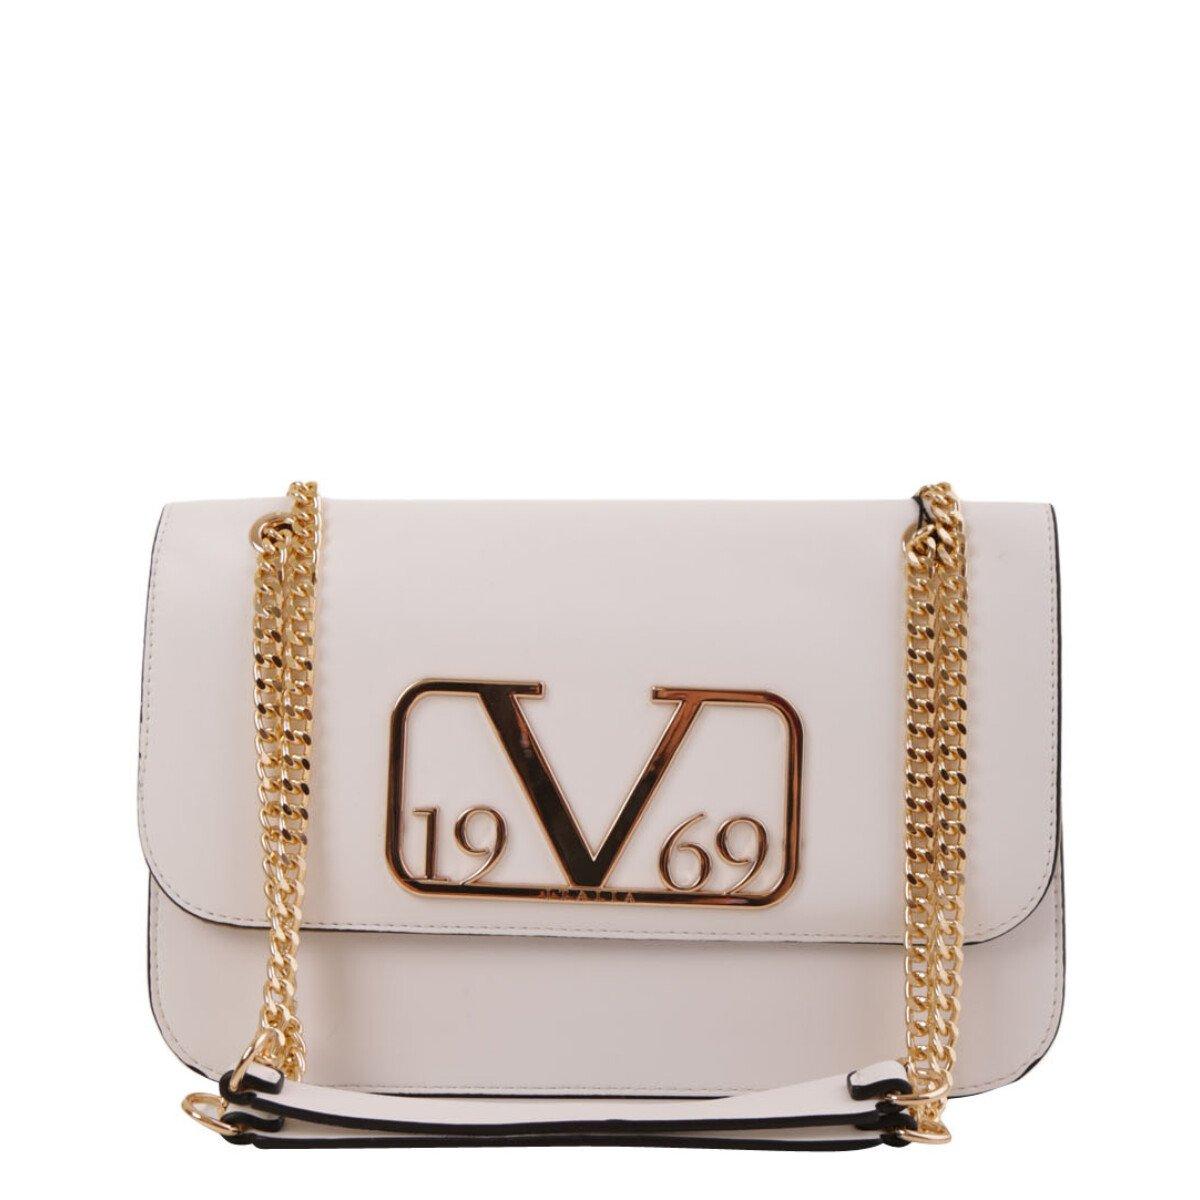 19v69 Italia Women's Handbag Various Colours 318965 - white UNICA